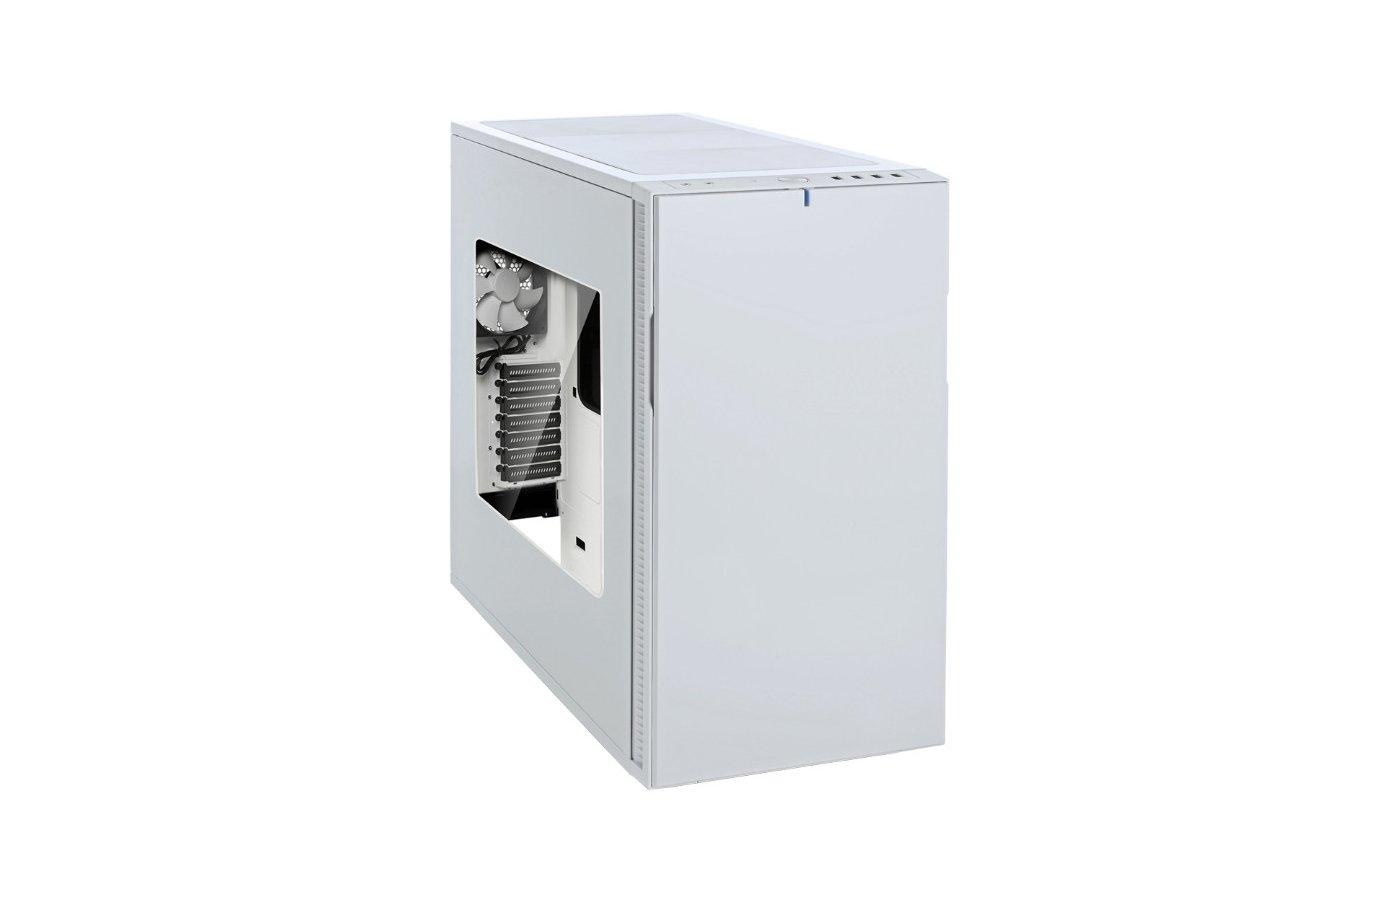 Корпус Fractal Design Define R5 Window белый w/o PSU ATX 8x120mm 8x140mm 2xUSB2.0 2xUSB3.0 audio front door